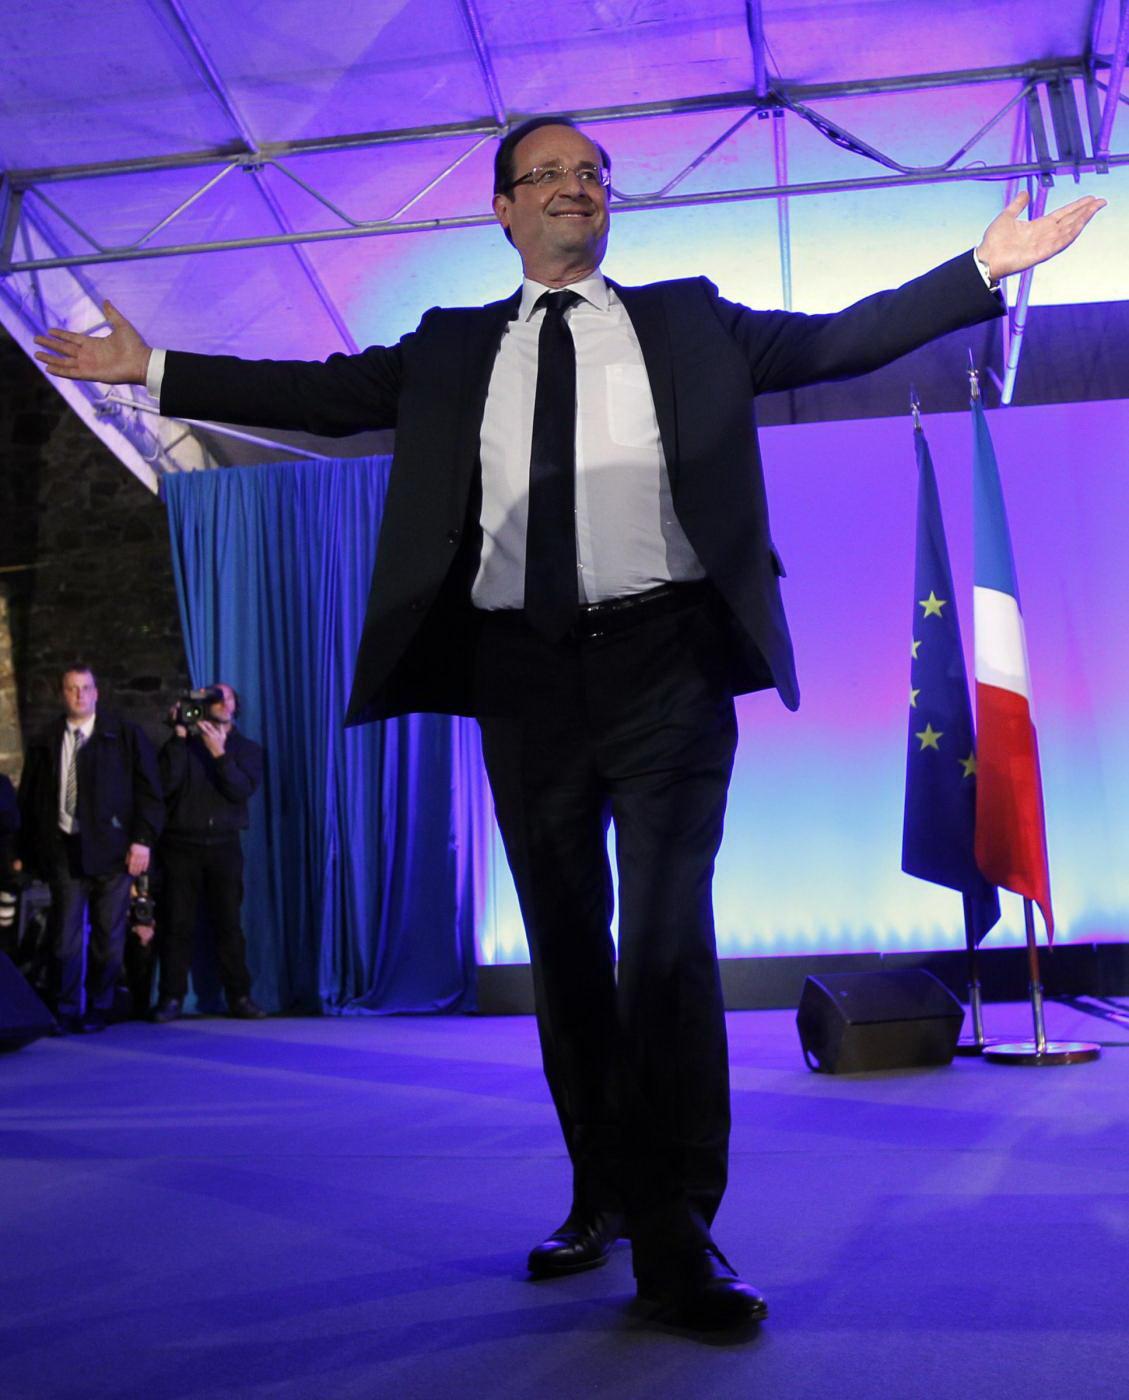 Evviva la Francia socialista!